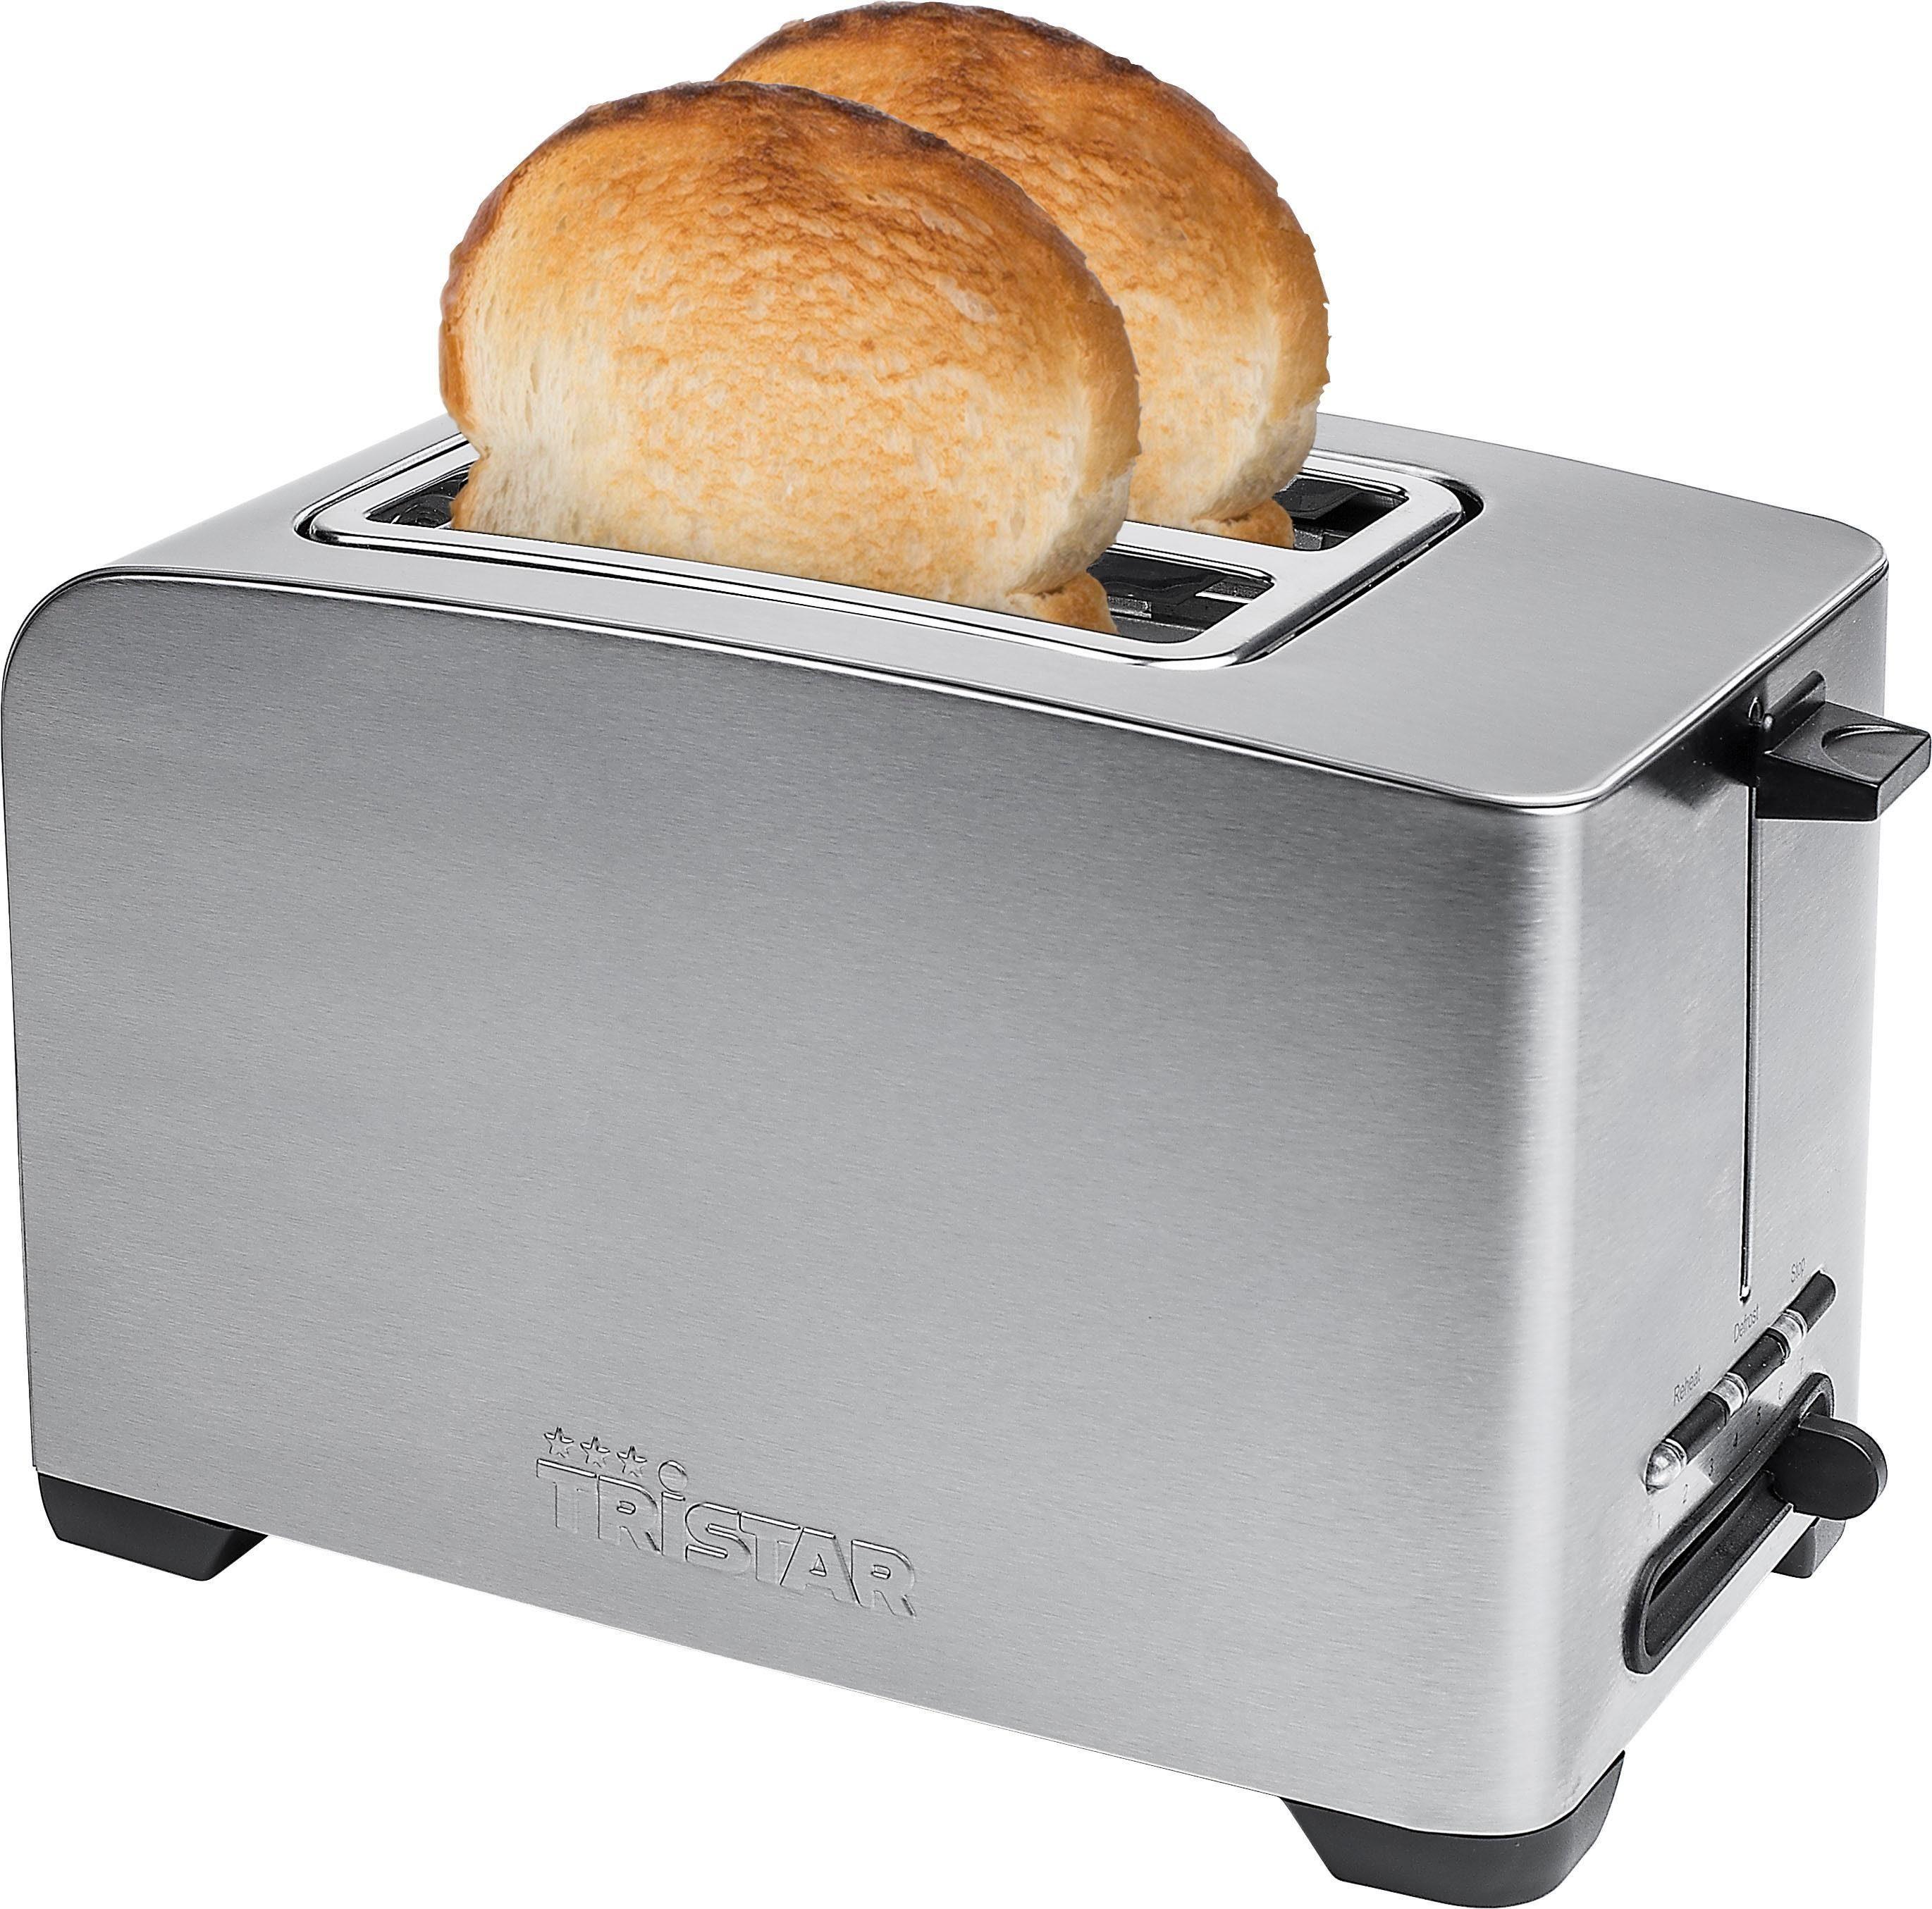 Tristar Toaster BR-2139, 2 kurze Schlitze, 850 W